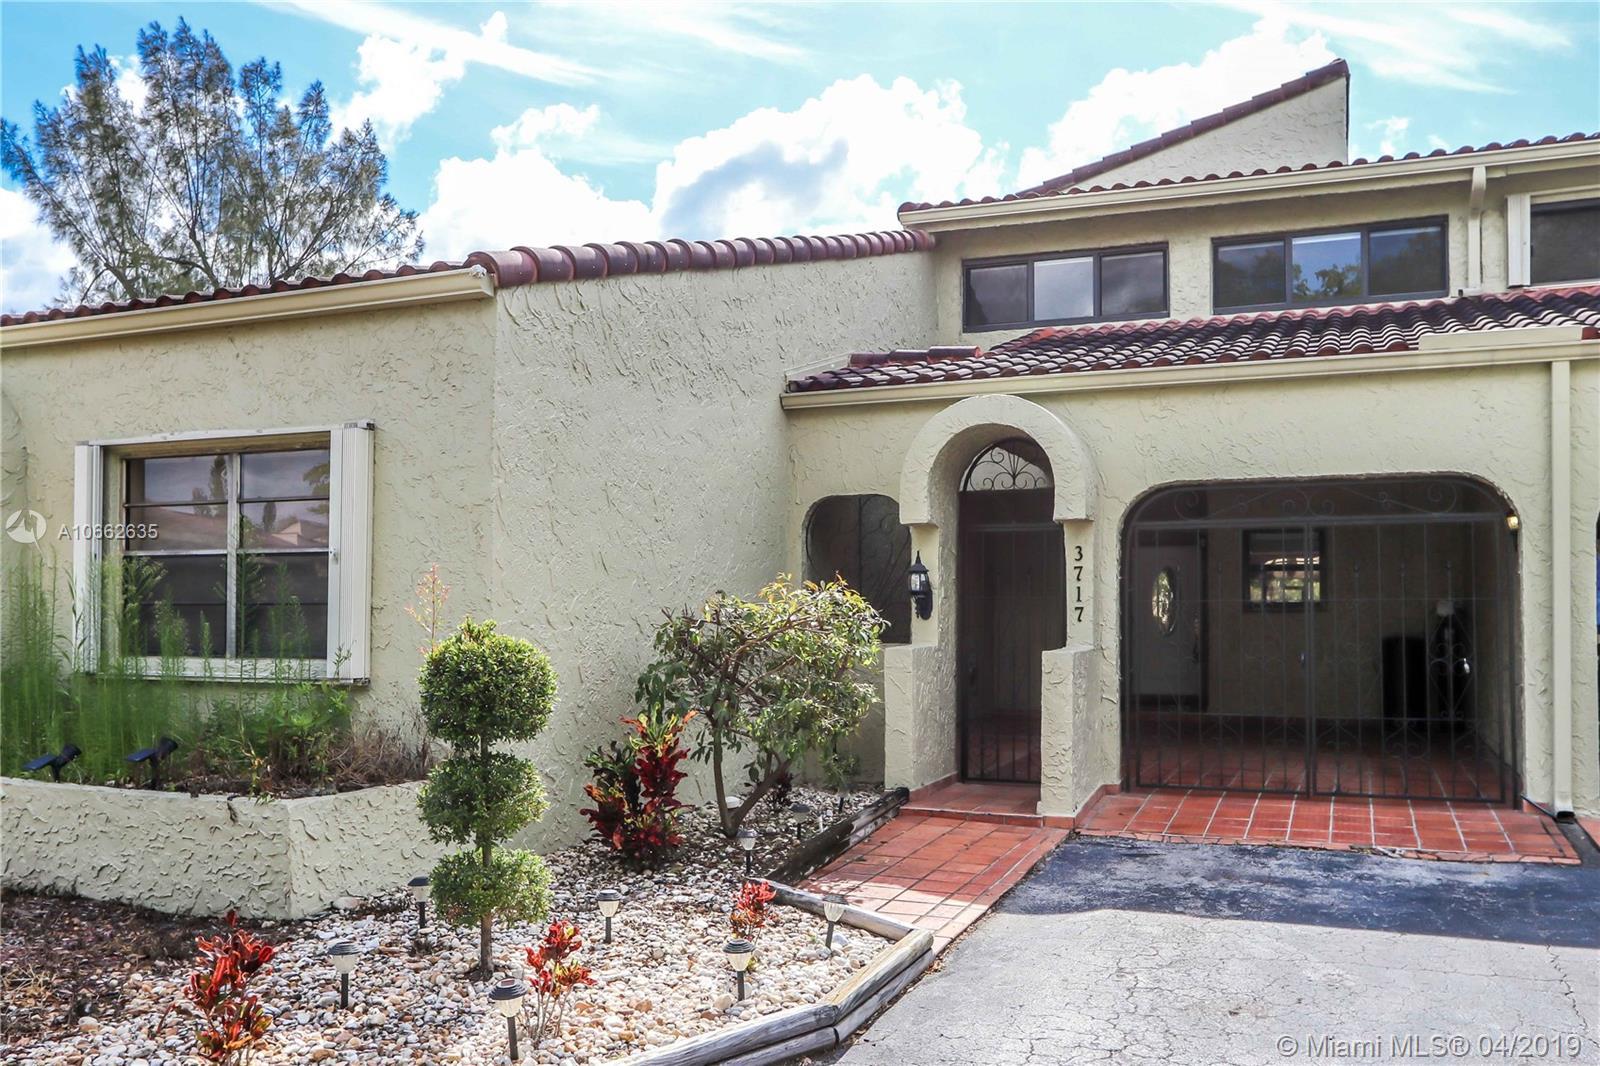 3717 Estepona Ave, Doral in Miami-dade County County, FL 33178 Home for Sale